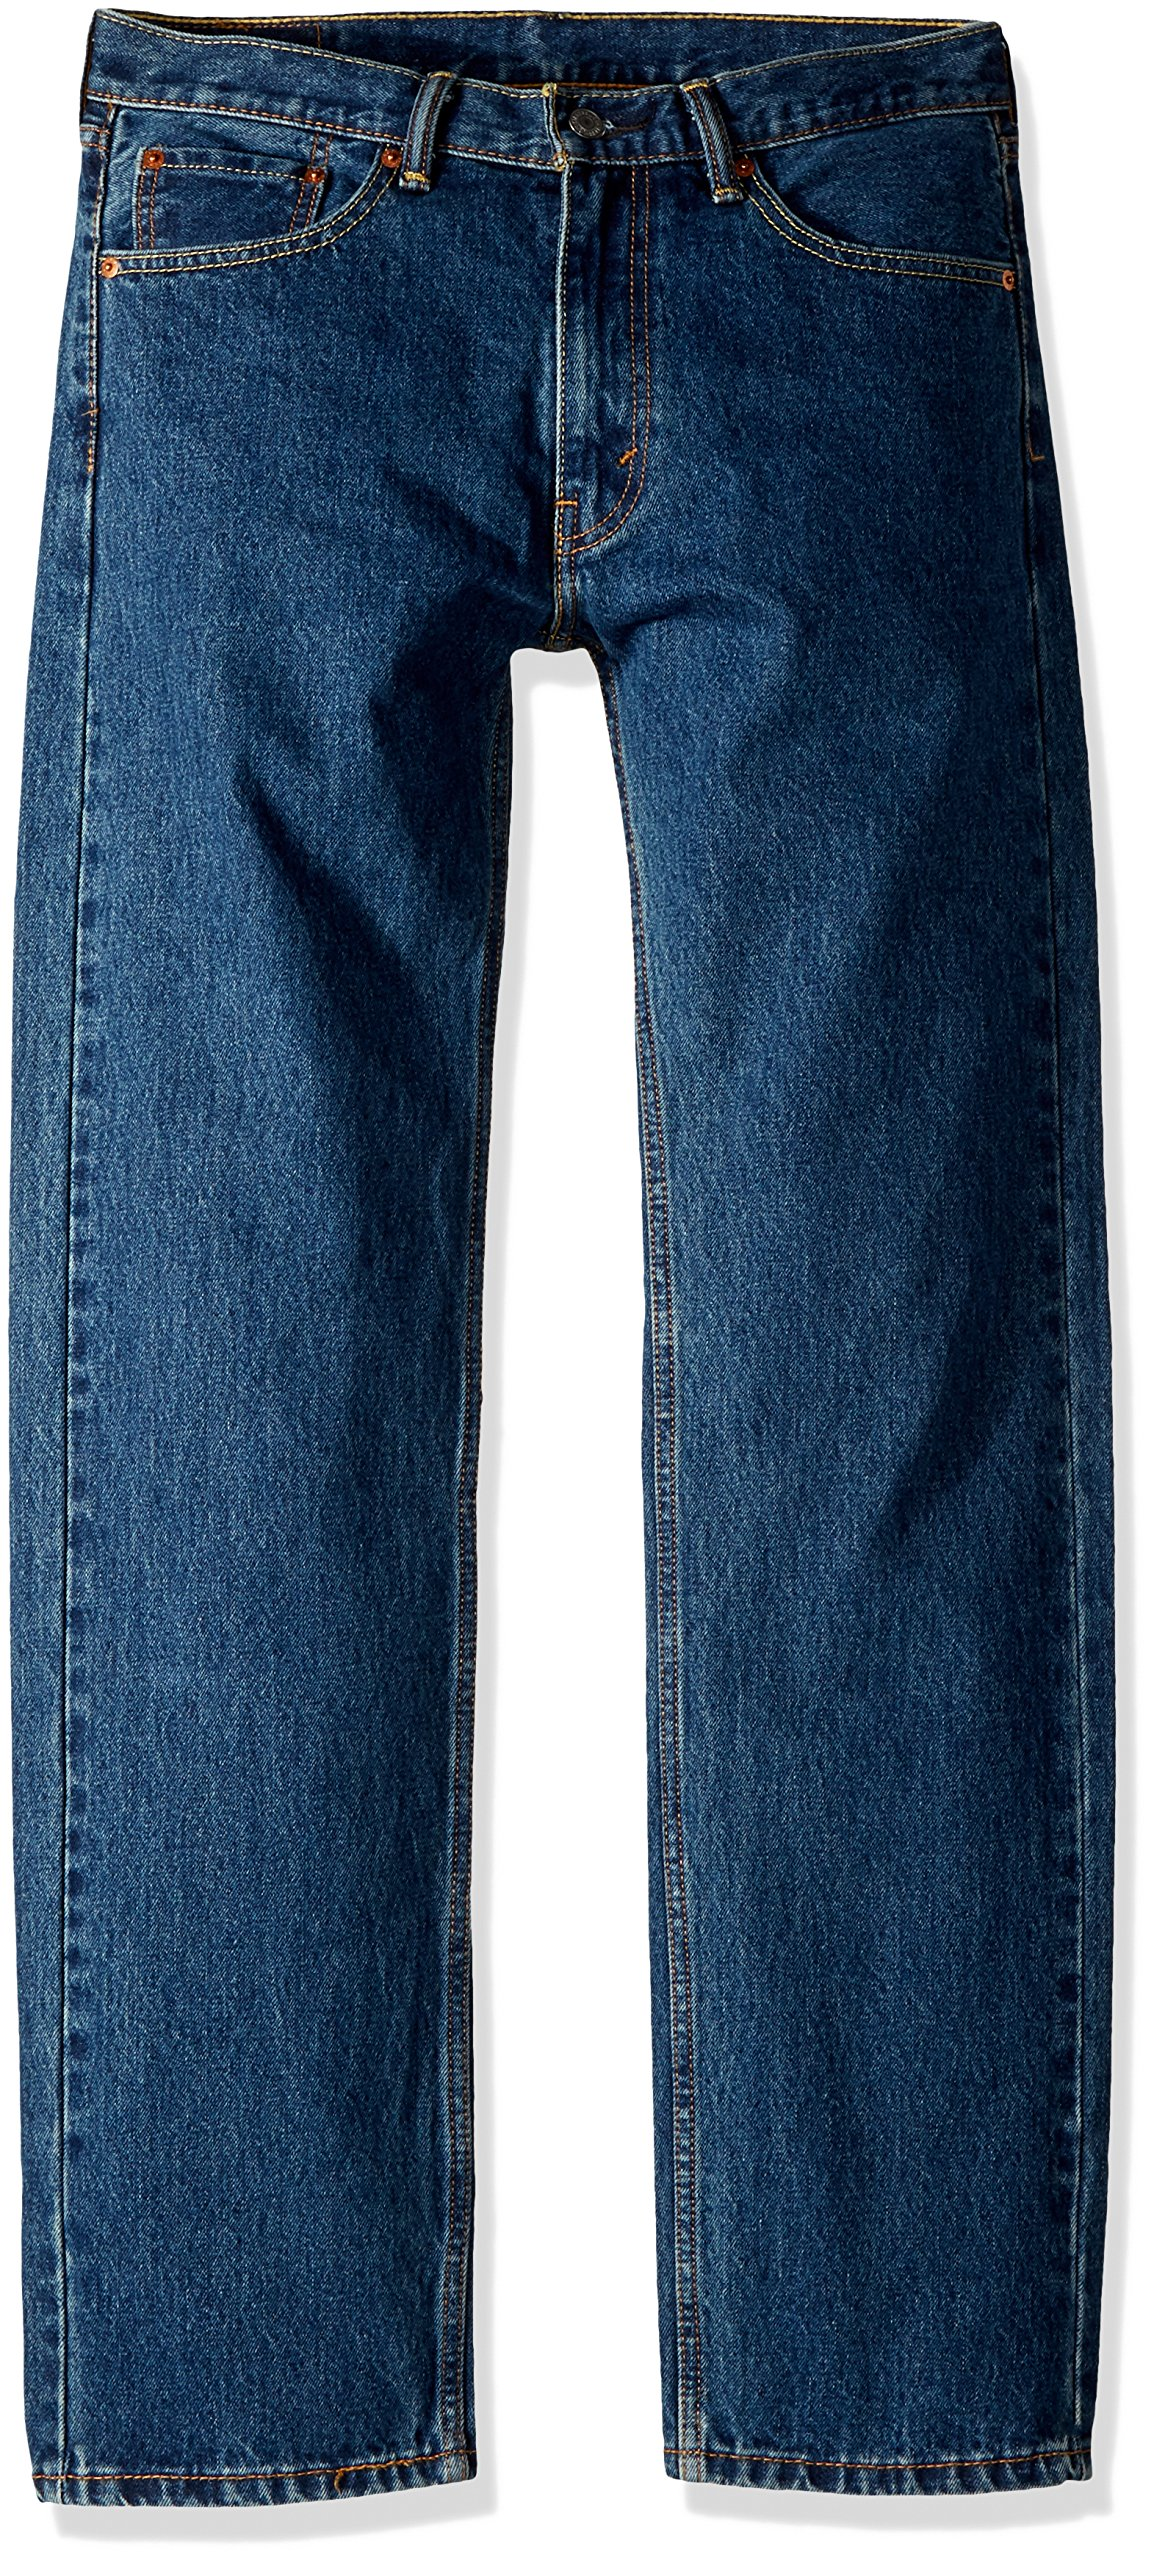 Levi's Men's 505 Regular Fit Jean, Dark Stonewash, 34x29